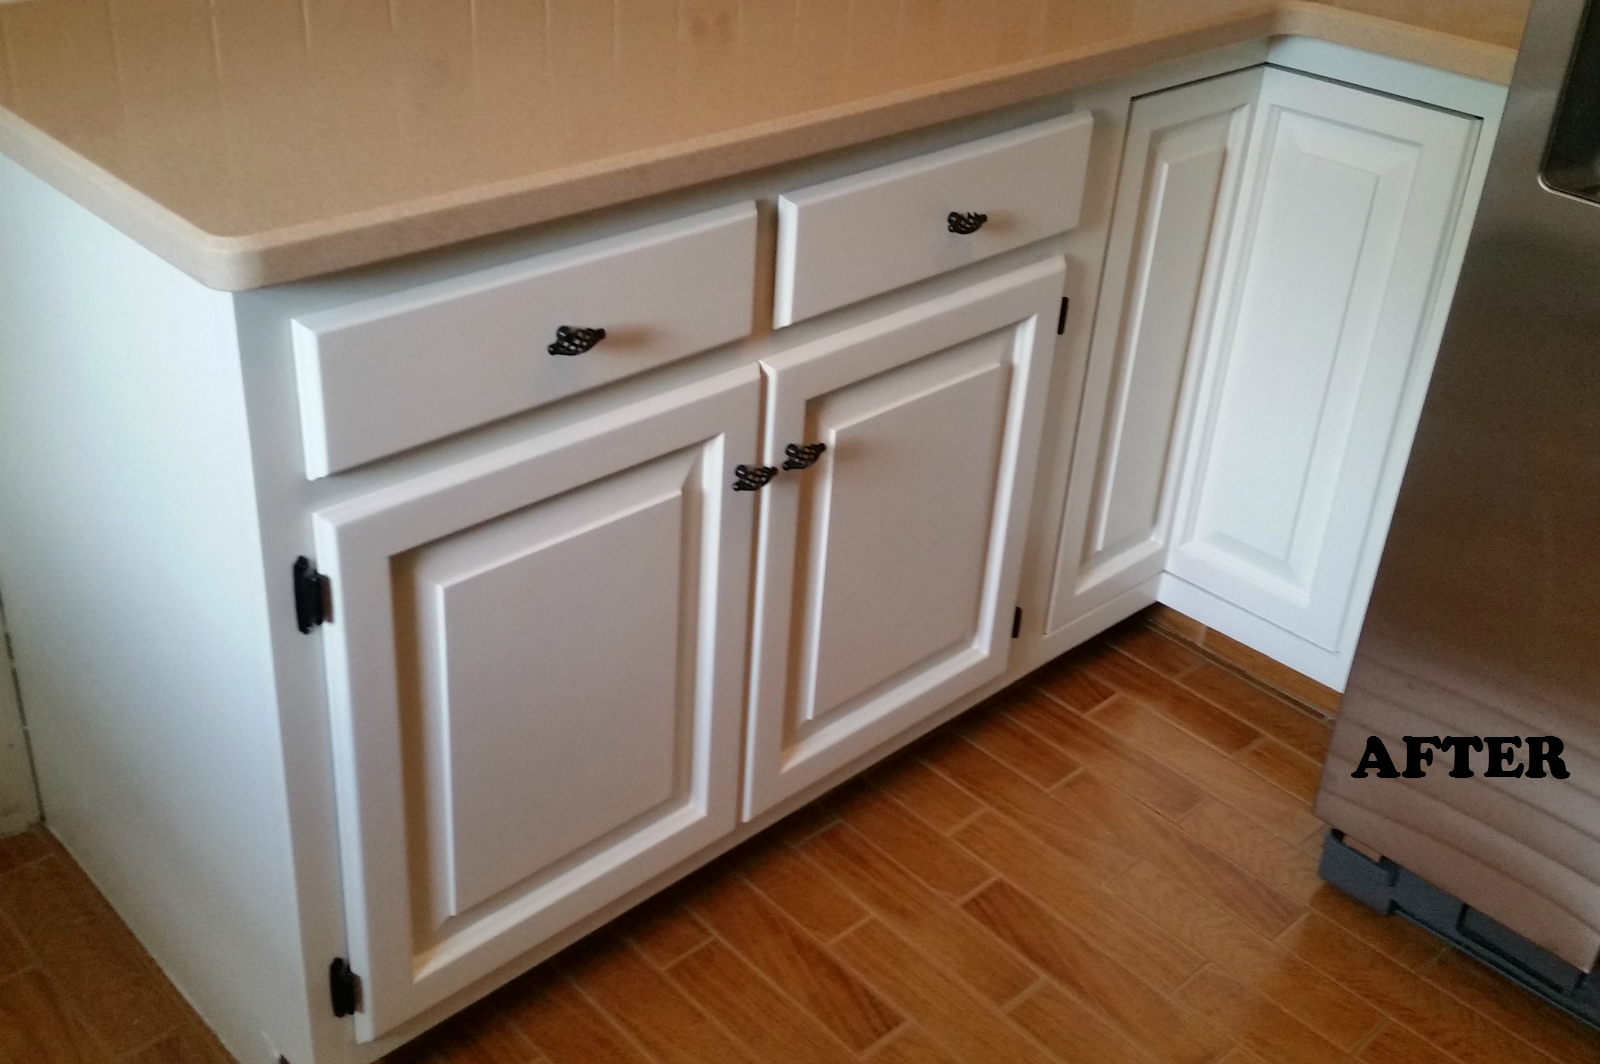 Refinishing Oak Cabinets Kitchen Cabinet Refinishing